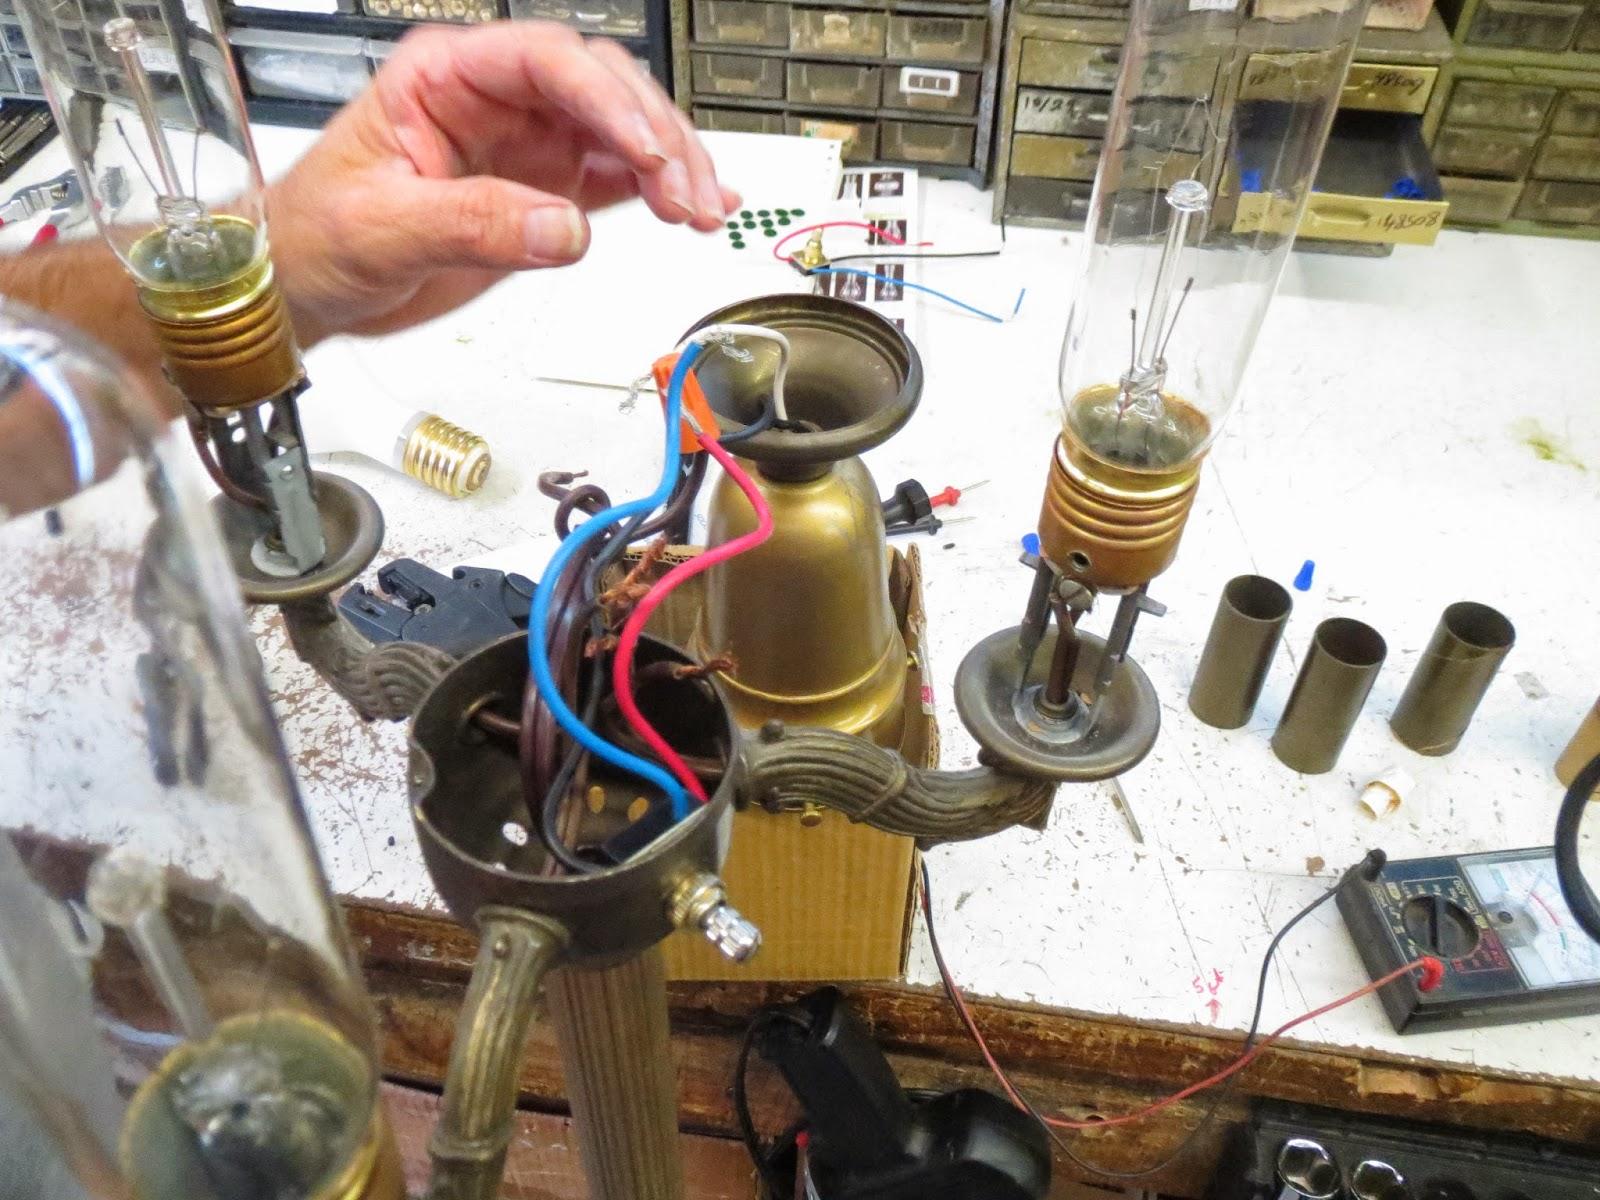 Wiring Diagram 6 Way Floor Lamp Auto Electrical Files